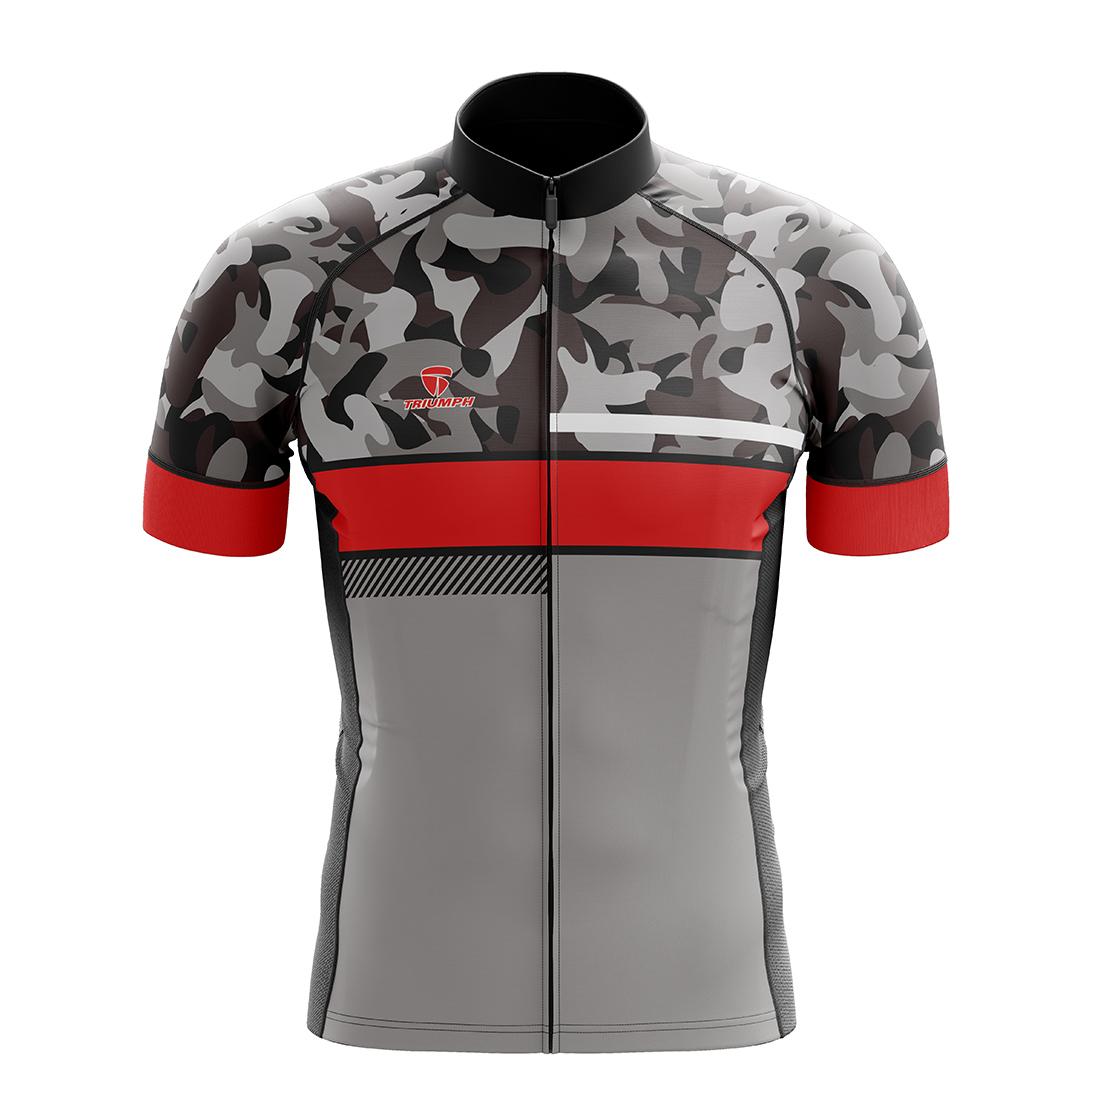 Mens Cycling Wear